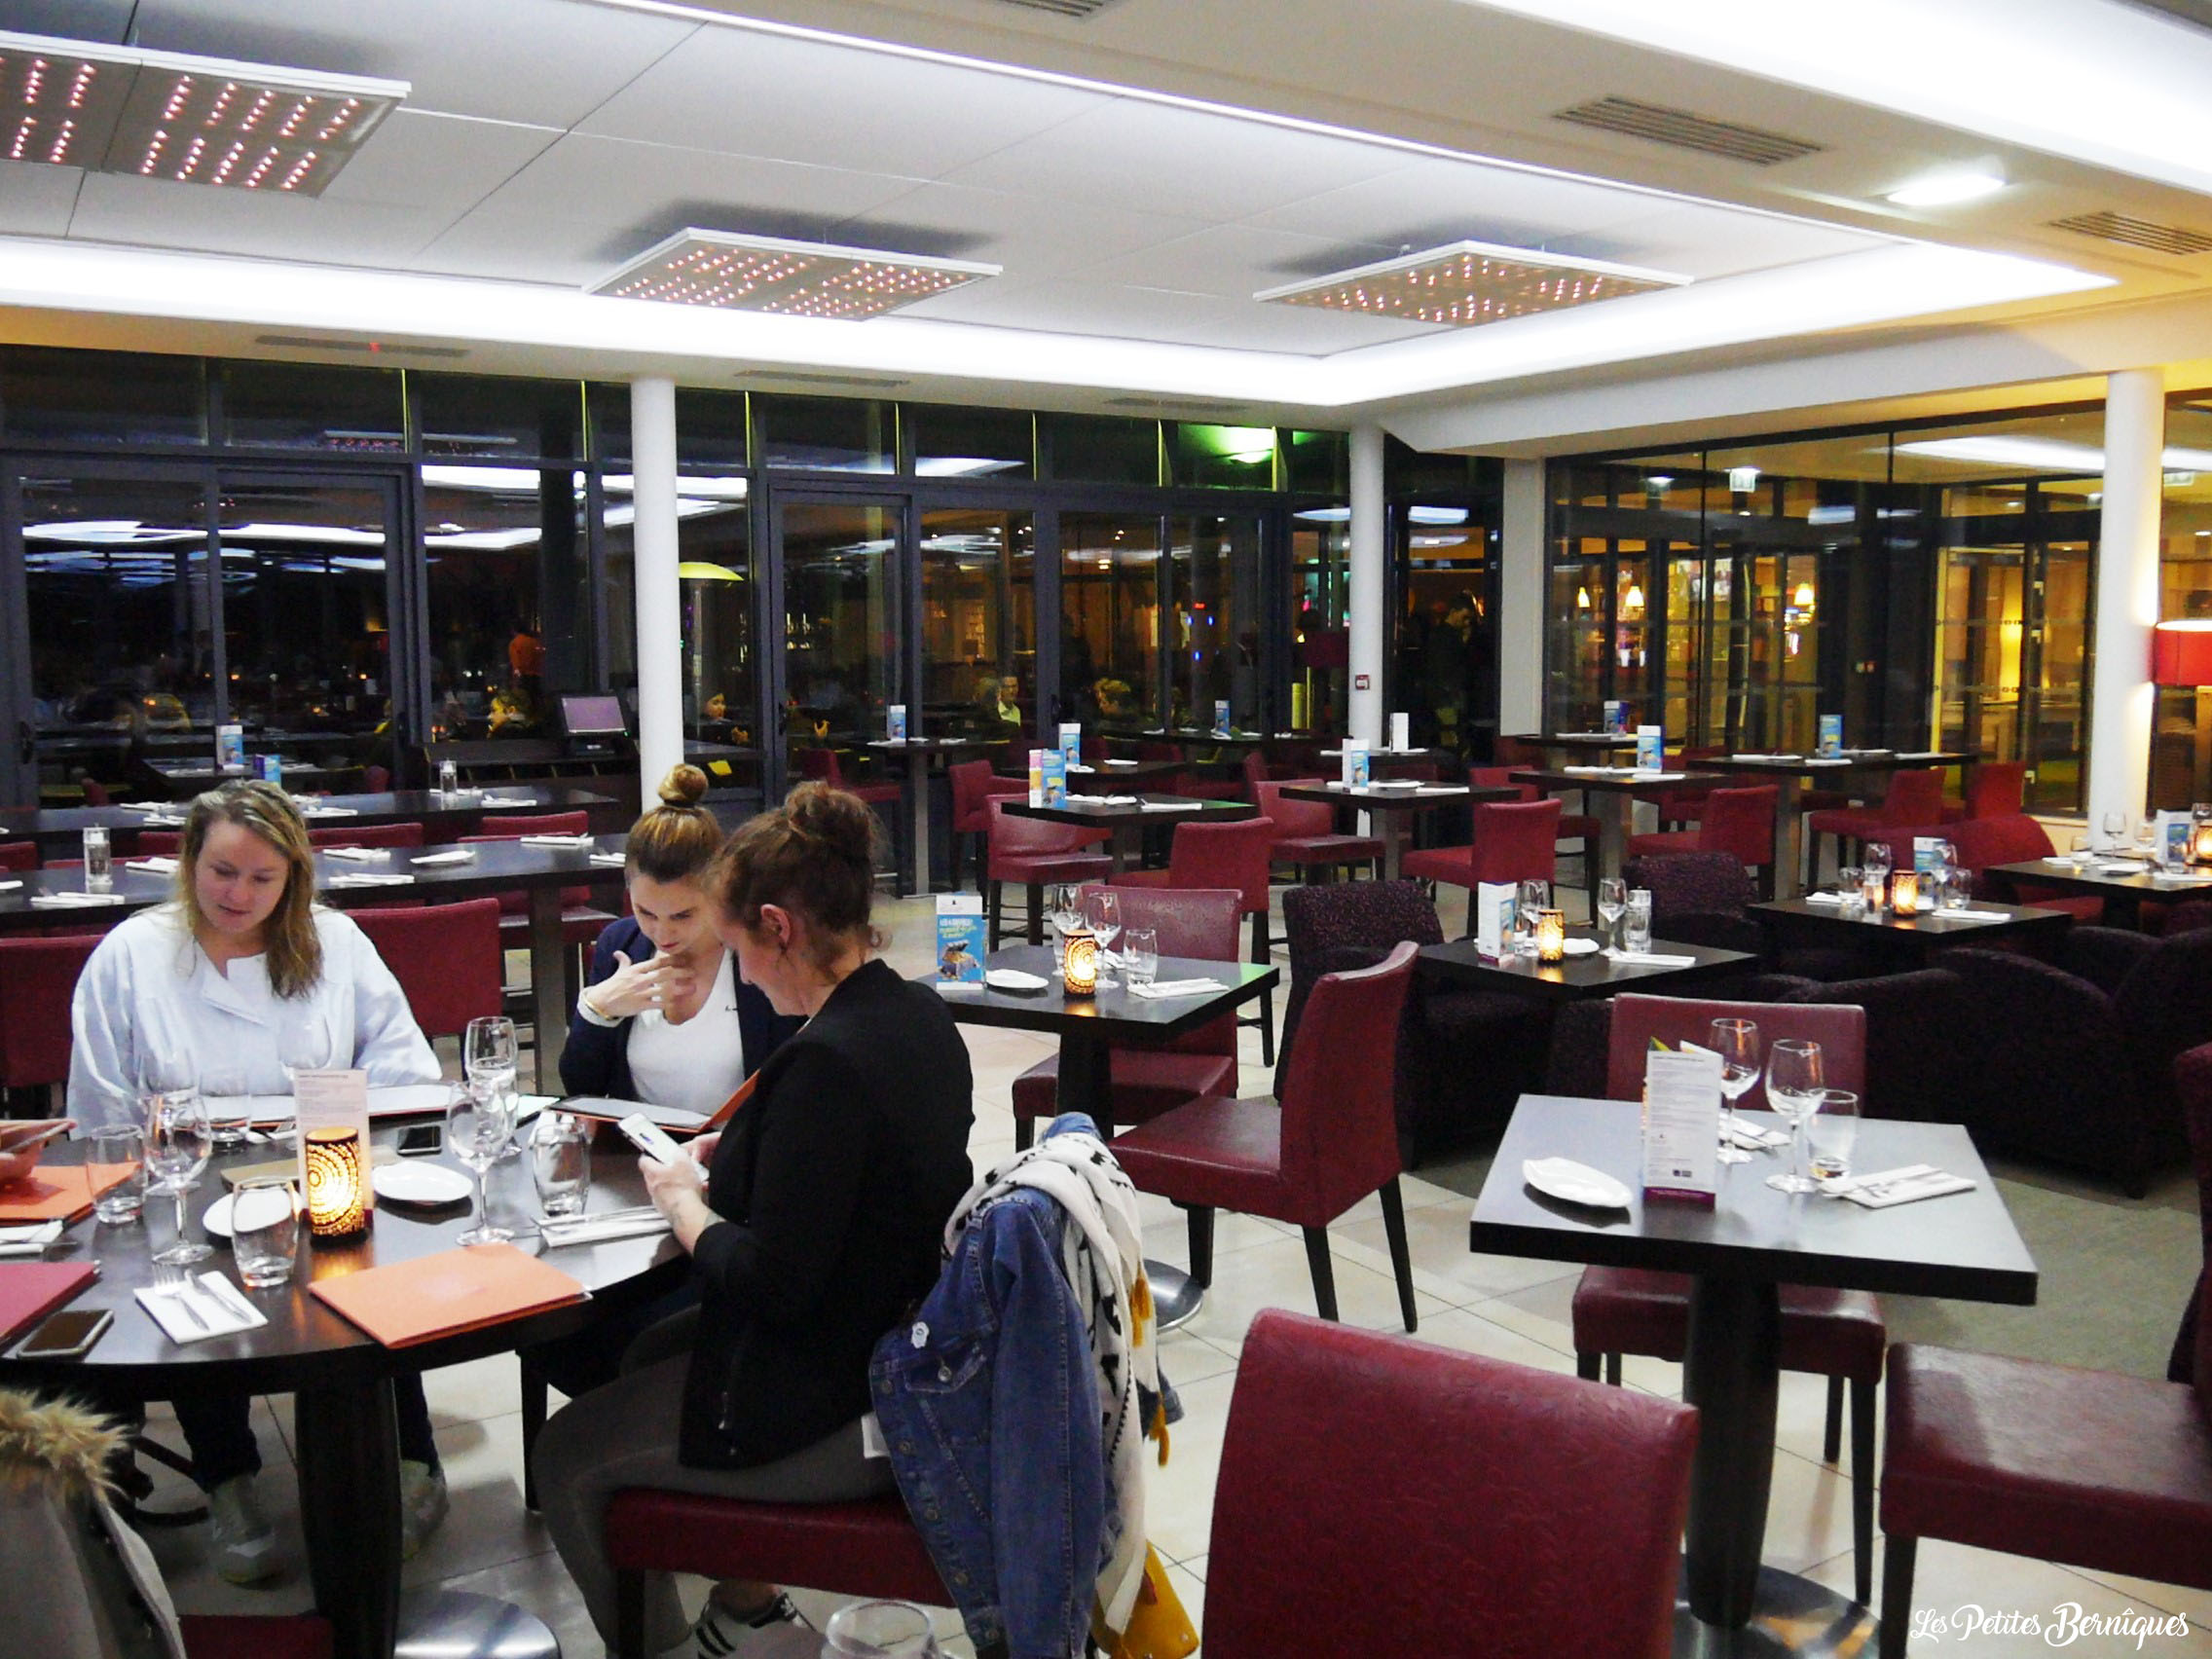 Restaurant Le Cap Saint-Brevin